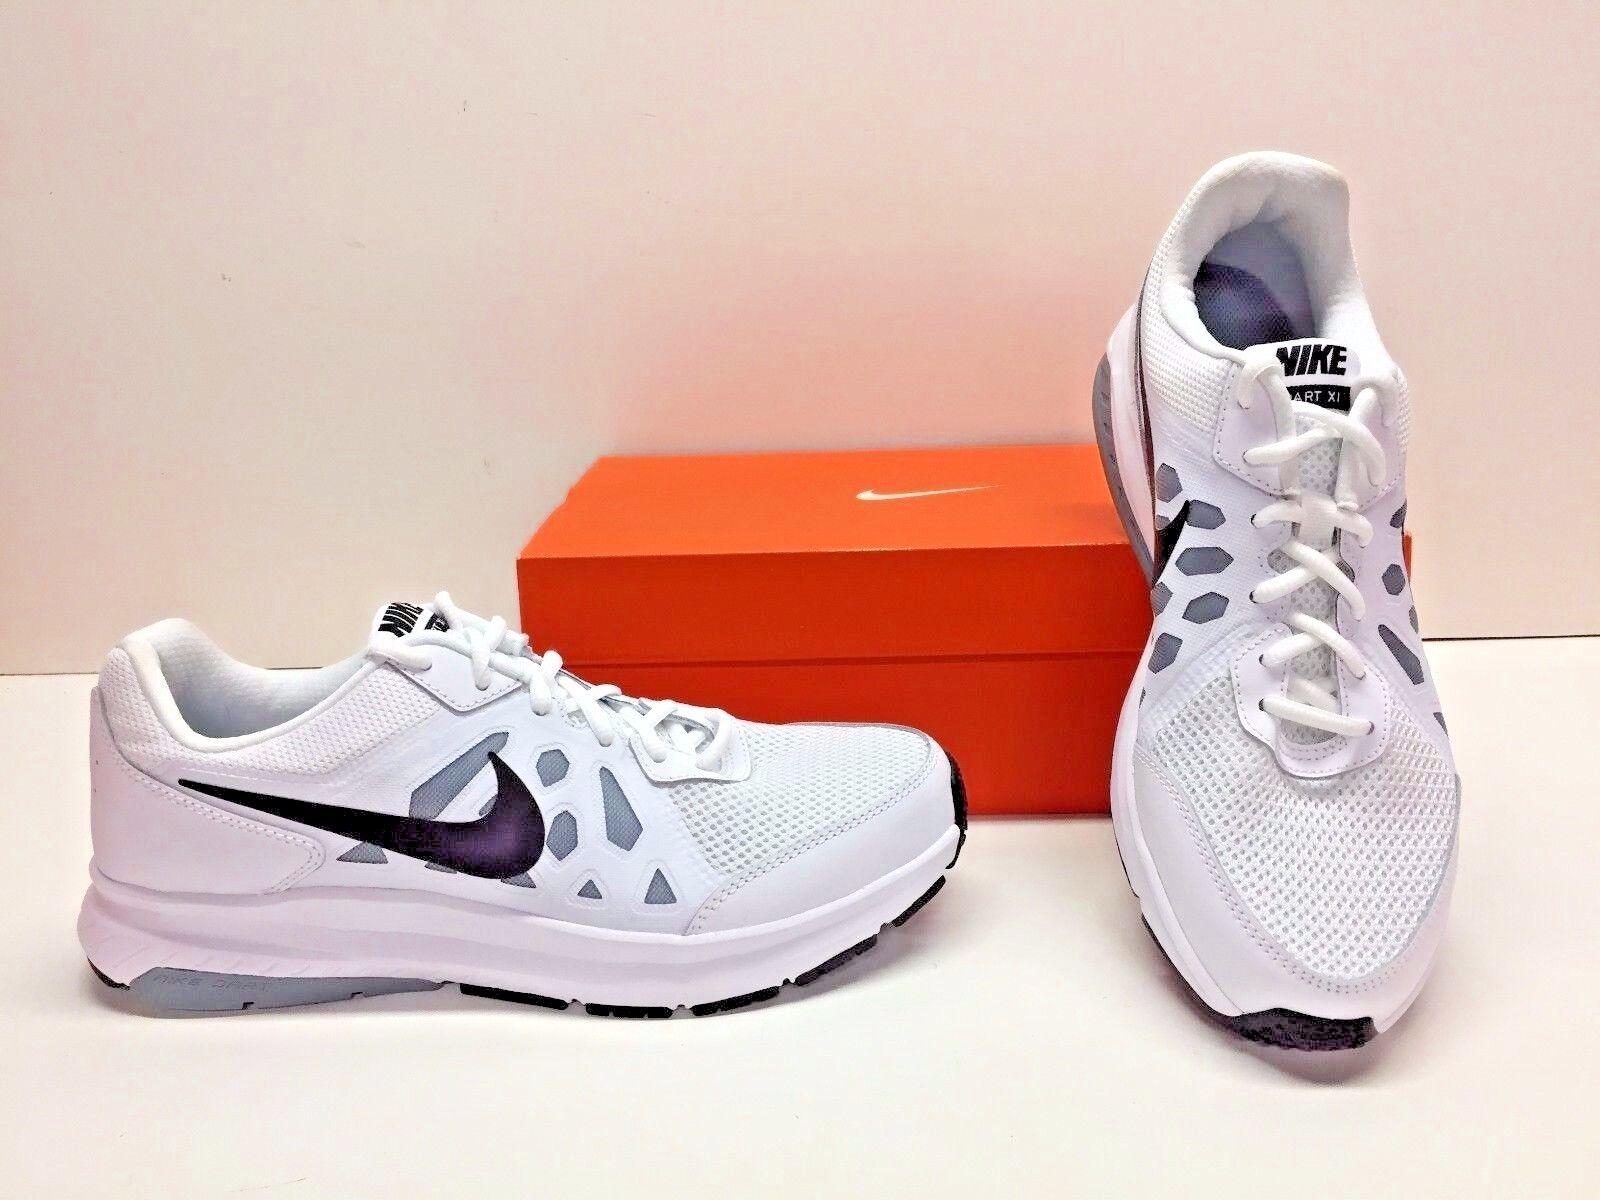 Nike Dart 11 Black XI Running Training White Black 11 Gray Sneakers Shoes Mens 11.5 40e750